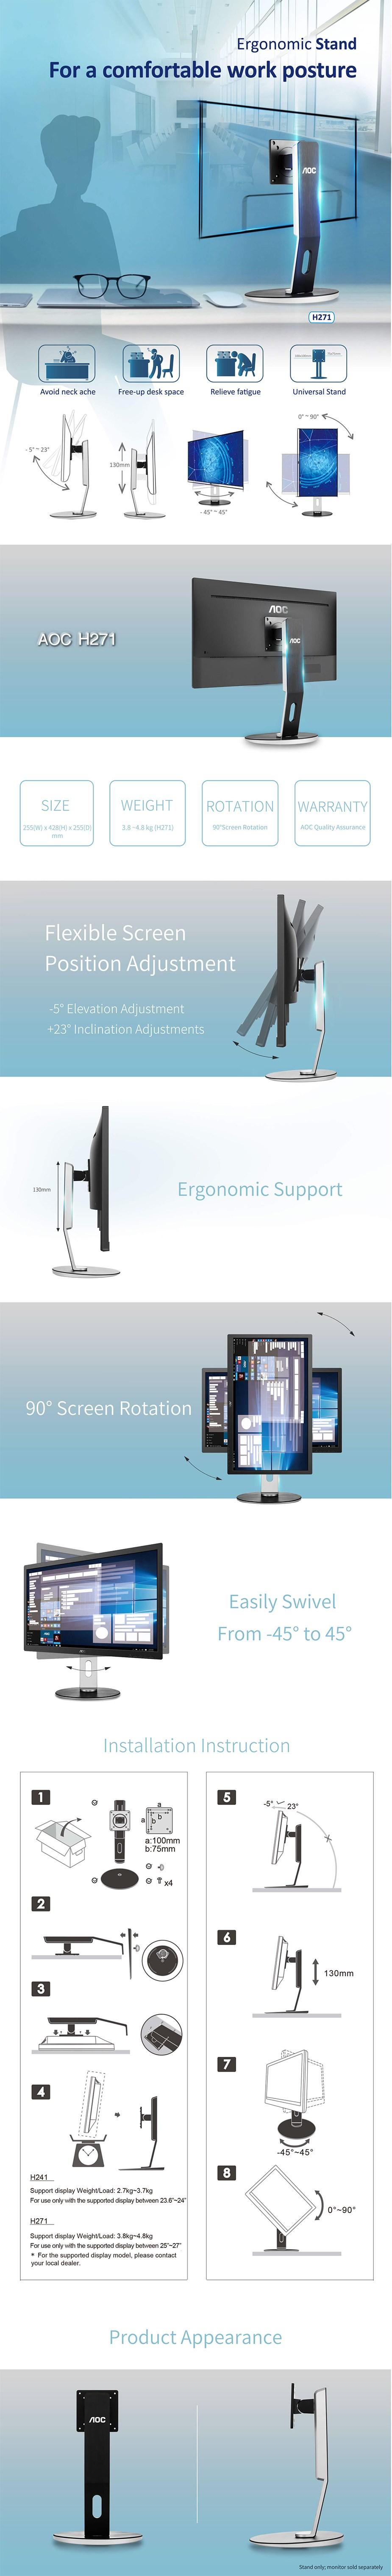 aoc-h271-ergonomic-adjustable-vesa-monitor-stand-ac33536-3.jpg